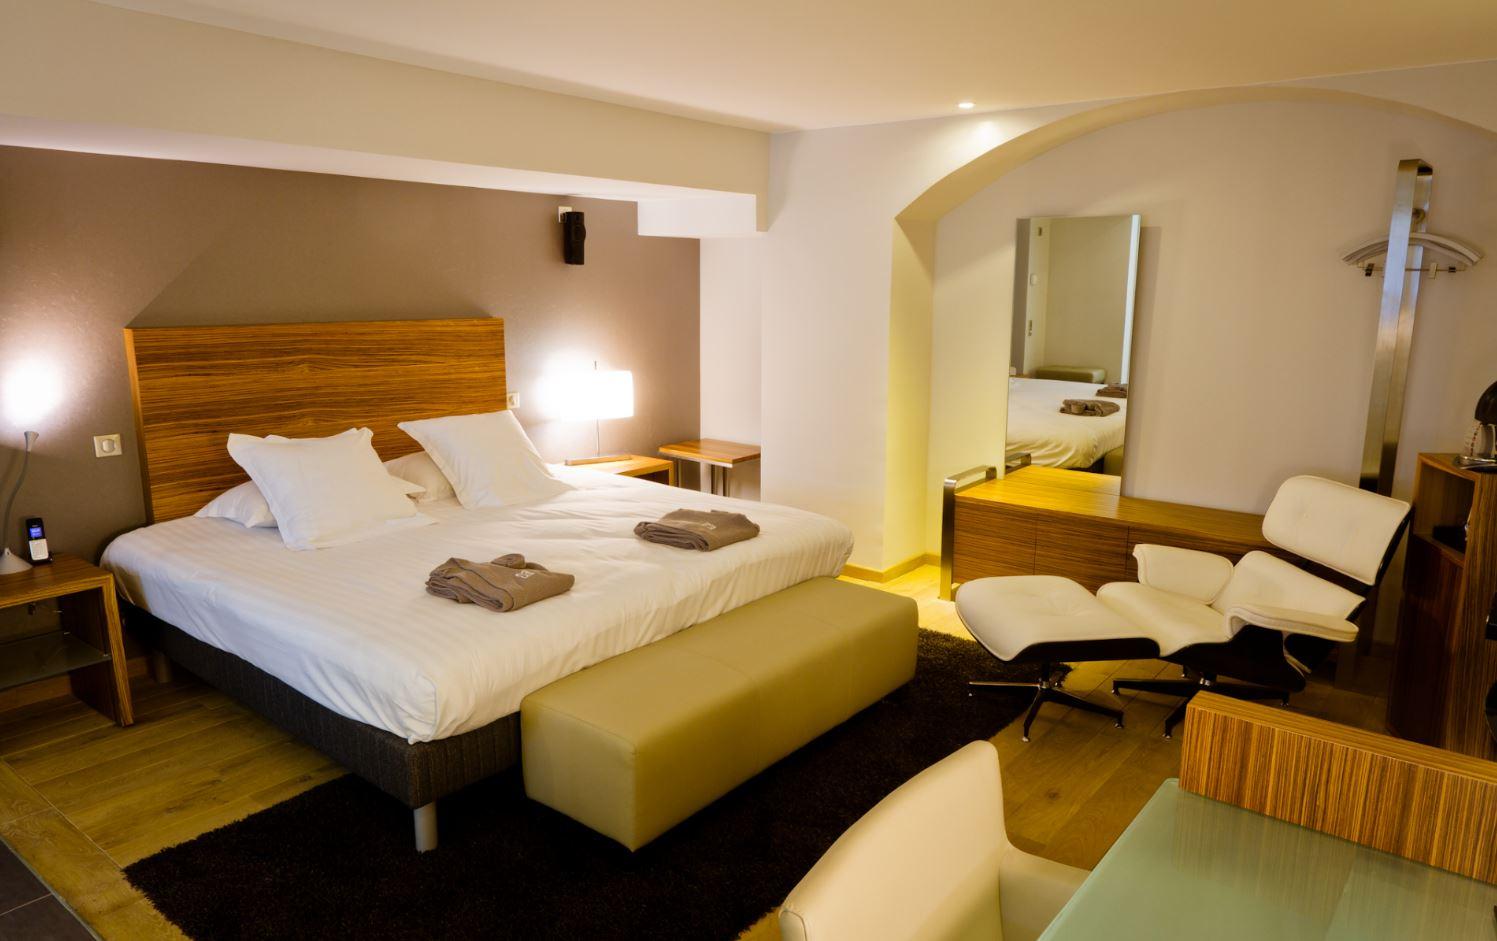 Hotelzimmer mit privatem jacuzzi basel whirlpool im zimmer elsass la villa k - Hotel jacuzzi chambre alsace ...